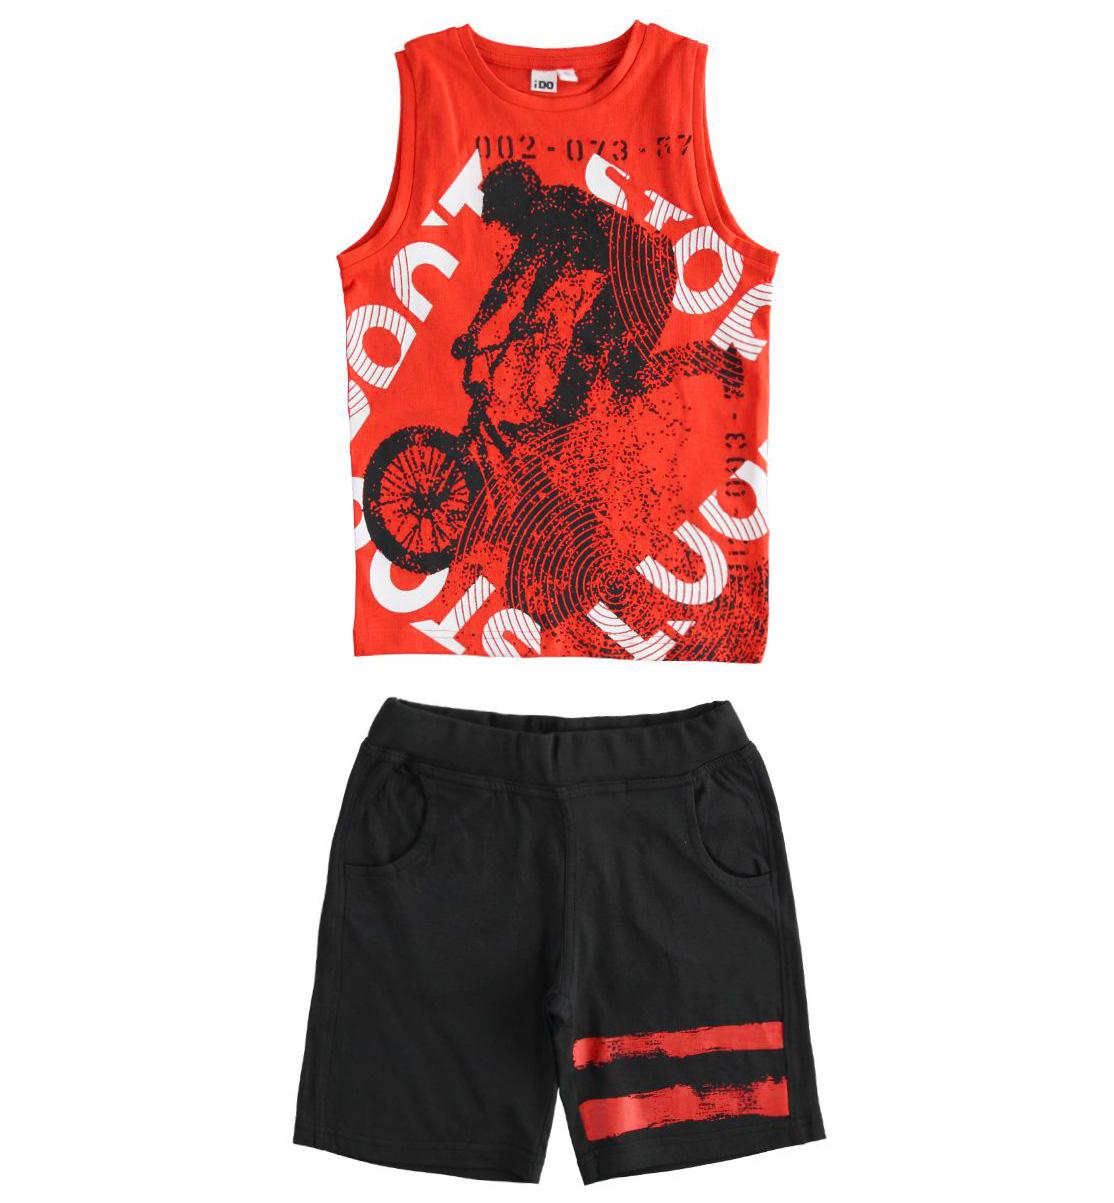 Piros trikós pamut szett fekete rövid bermuda nadrággal